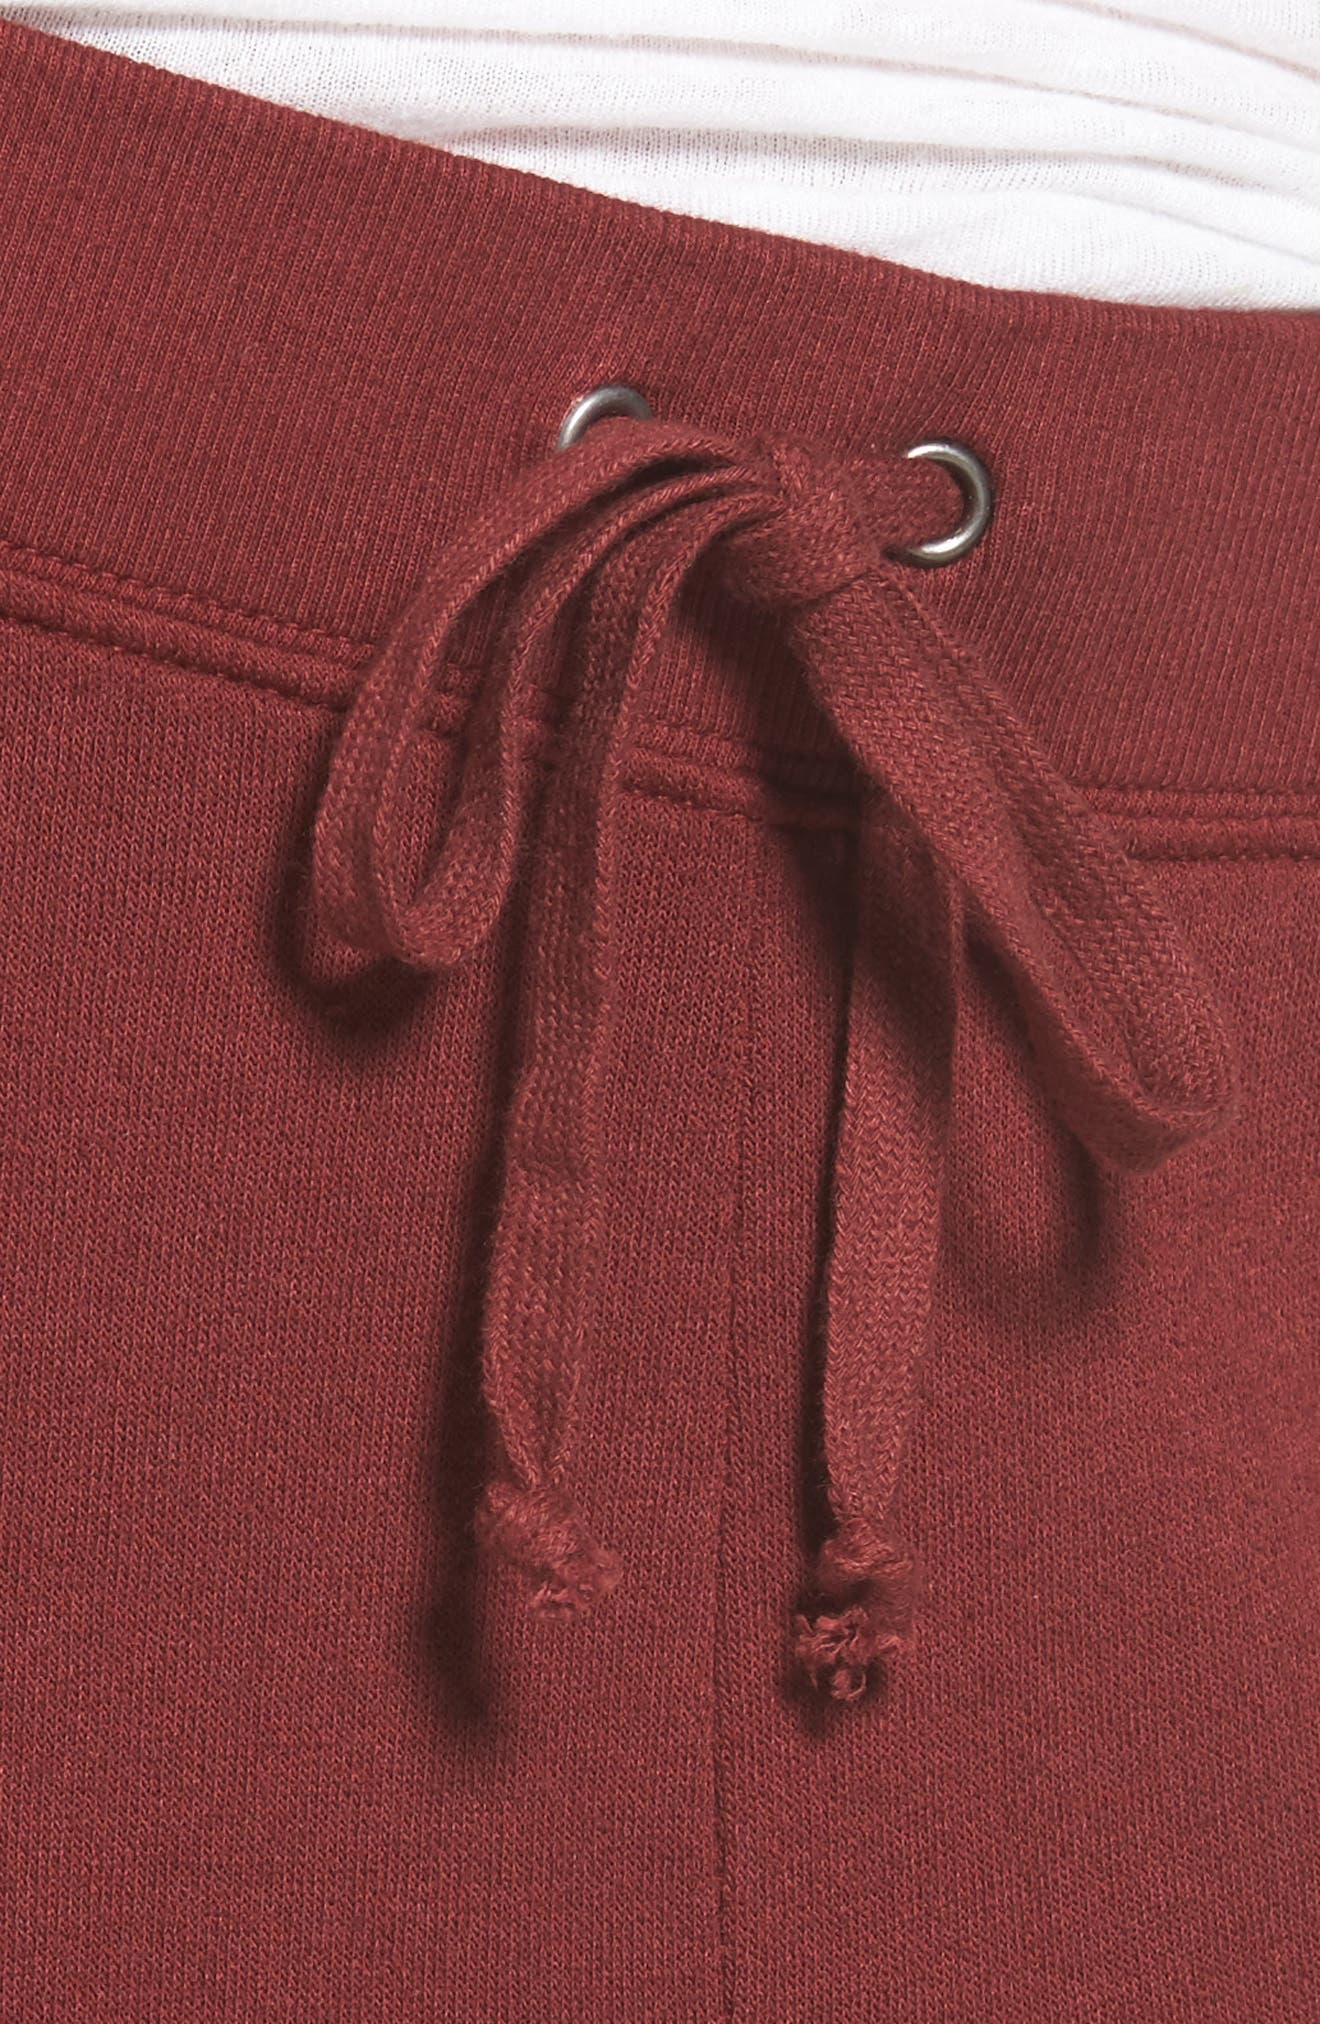 Fleece Sweatpants,                             Alternate thumbnail 4, color,